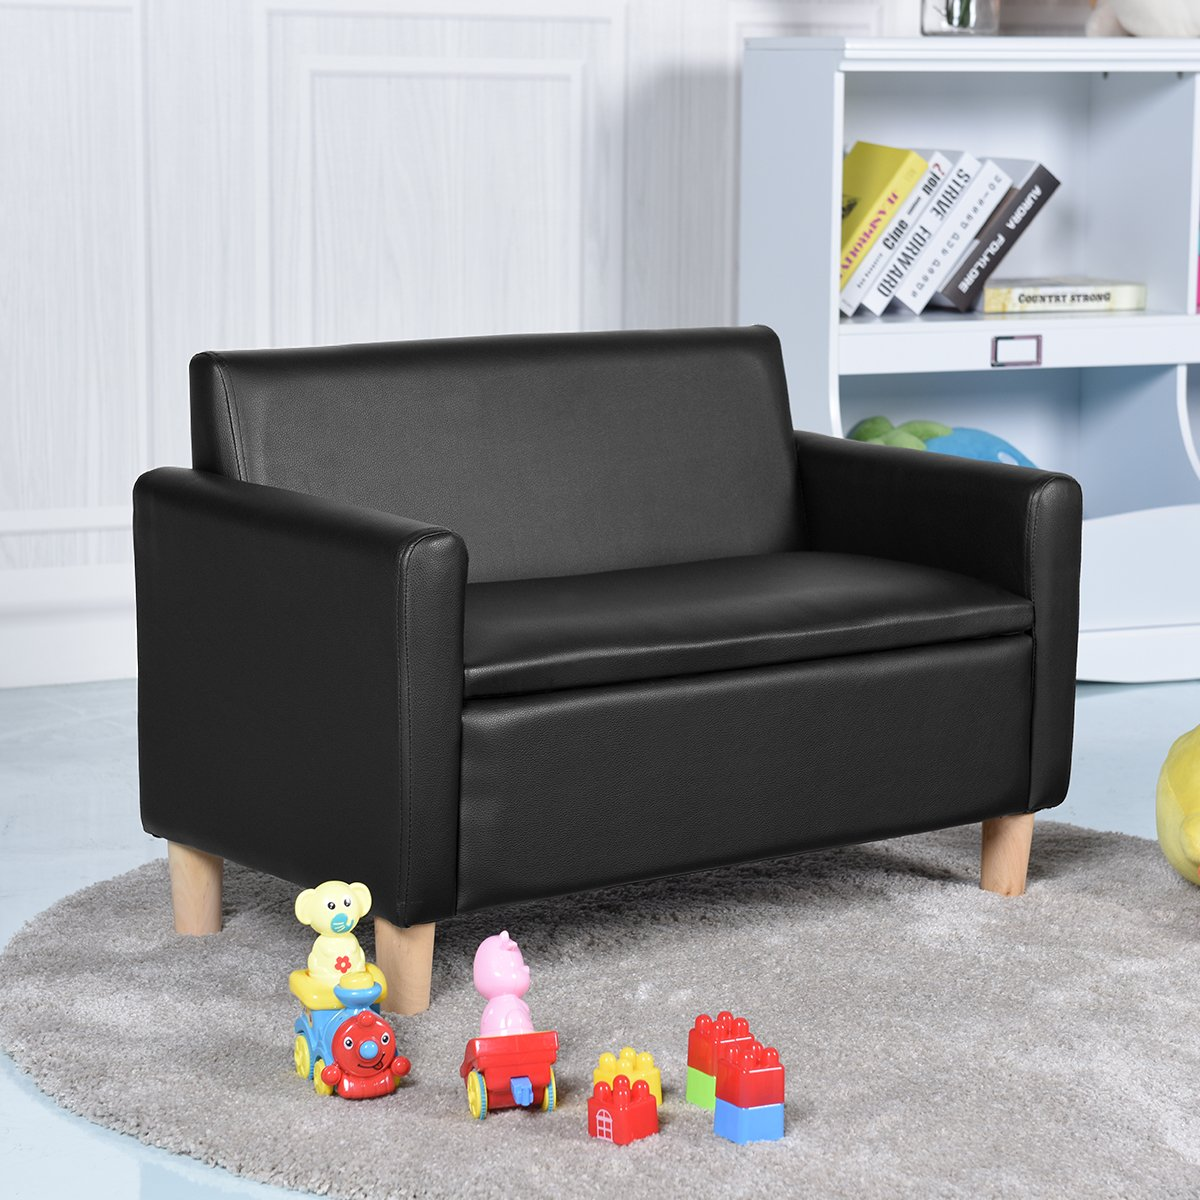 Tremendous Costway Kids Sofa Storage Children Armchair Single Andrewgaddart Wooden Chair Designs For Living Room Andrewgaddartcom